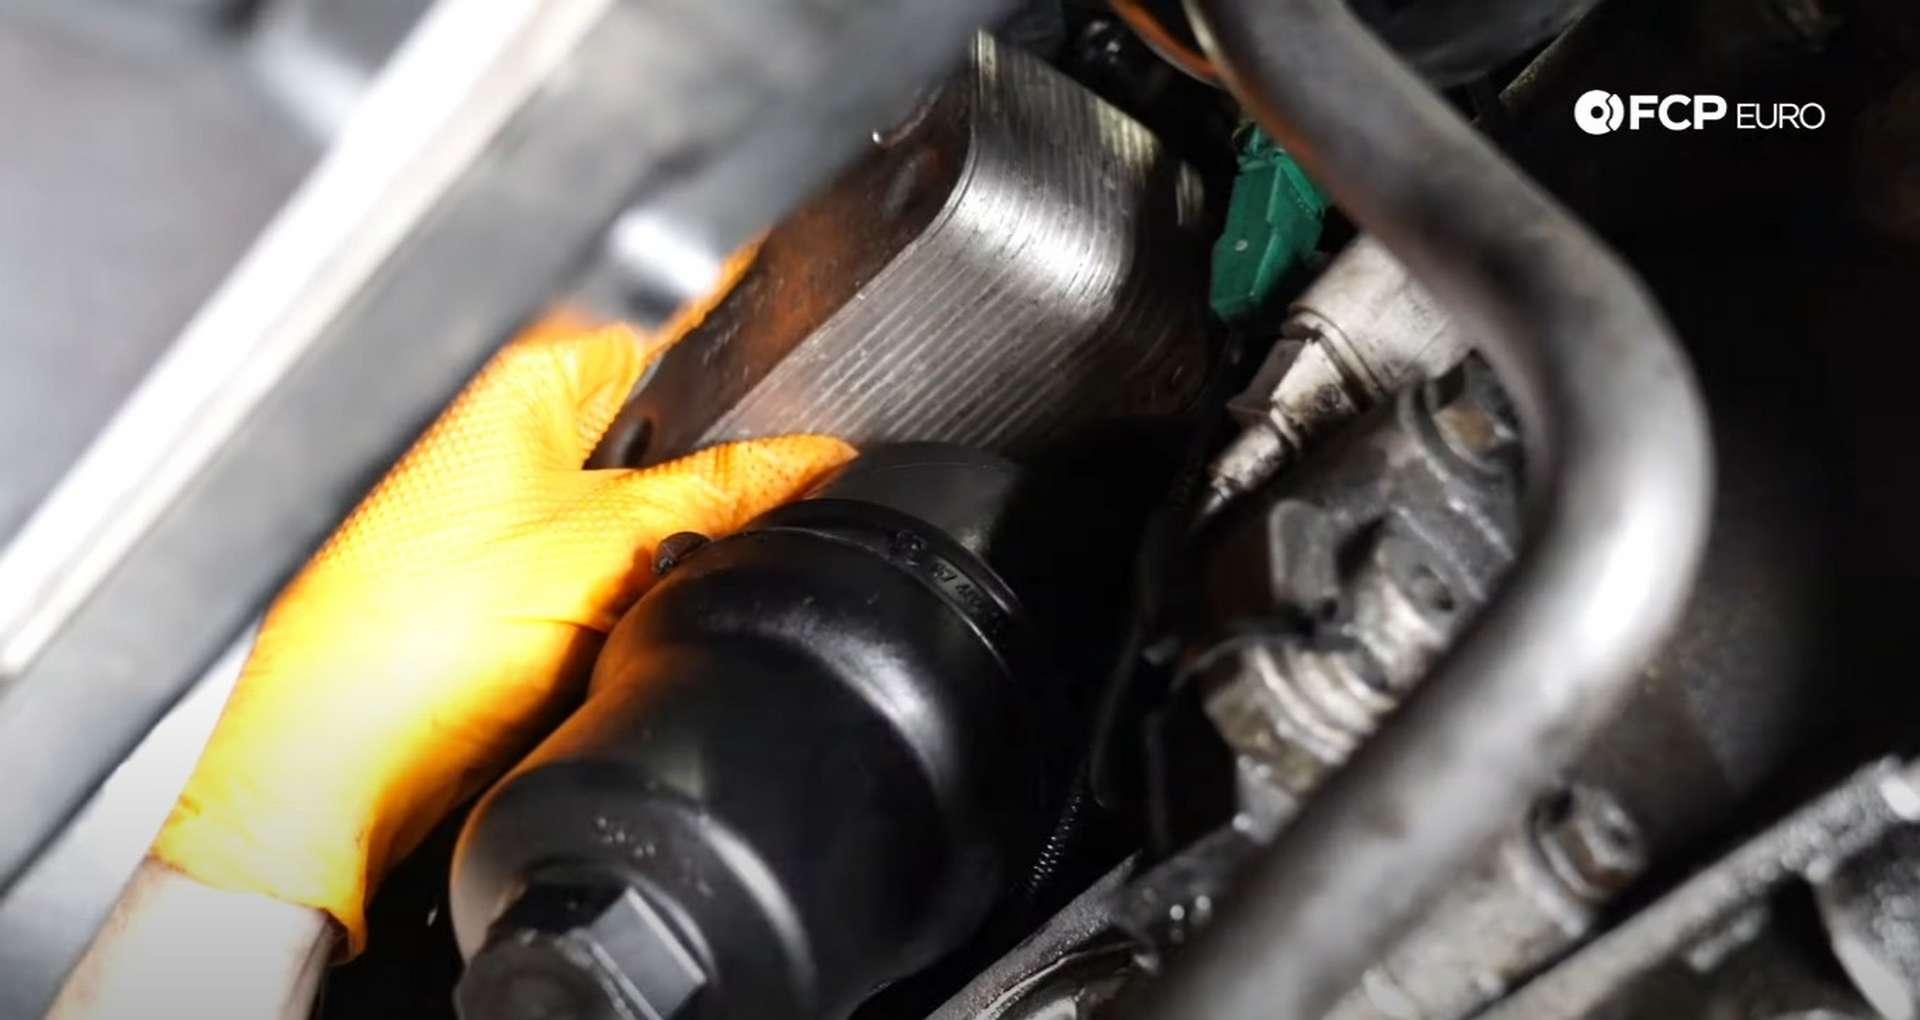 28-DIY-Mk5-GTI-Oil-FIlter-Housing_Reinstalling-Oil-Cooler